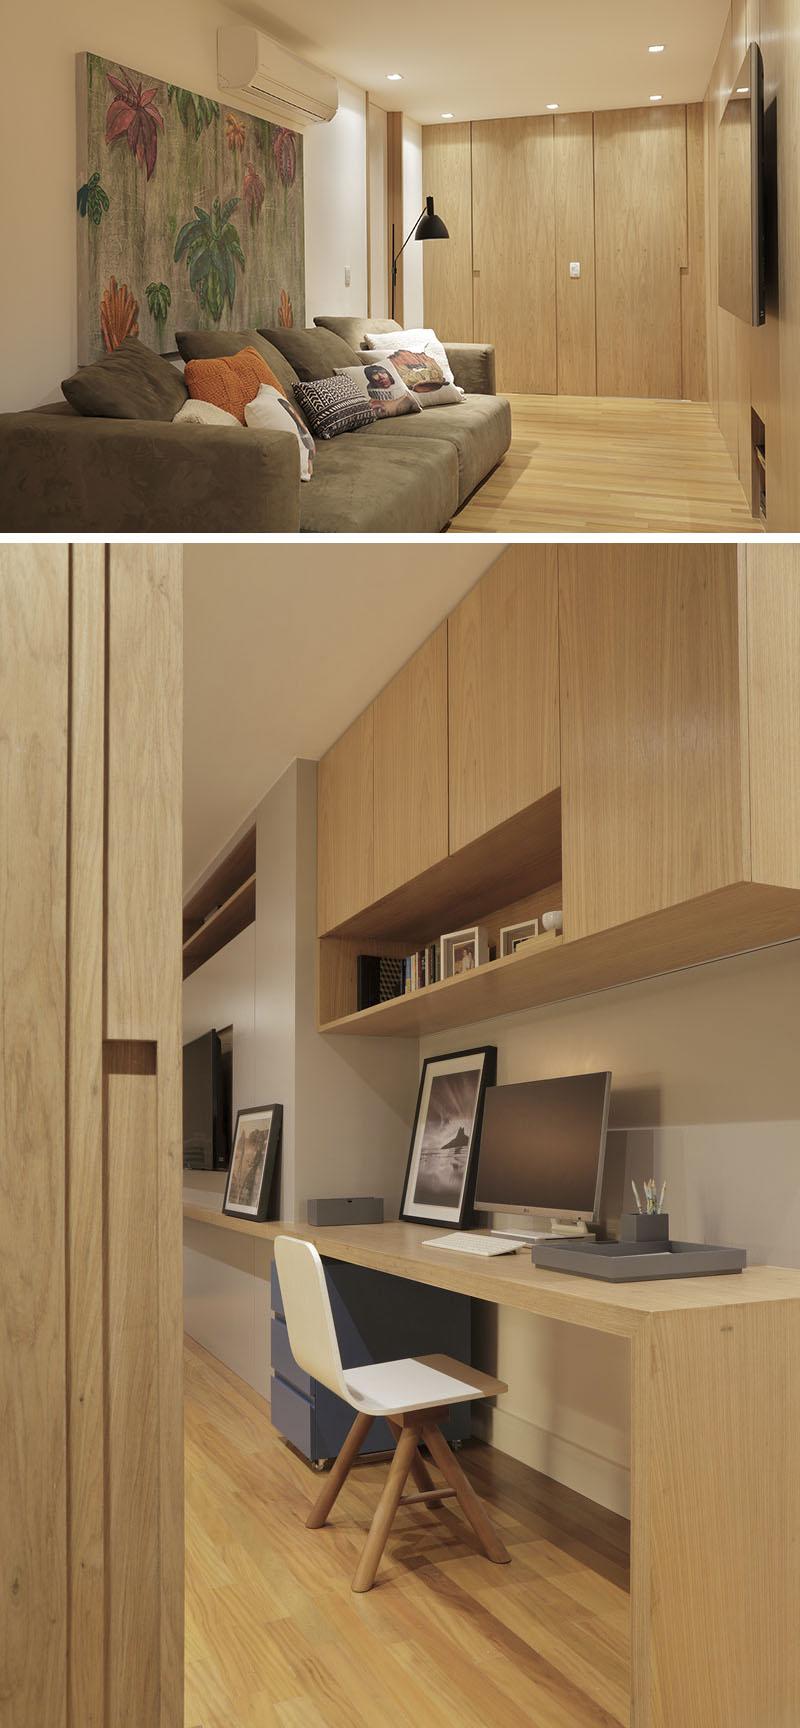 Apartment's Interior Design Featuring Wood Accents 7